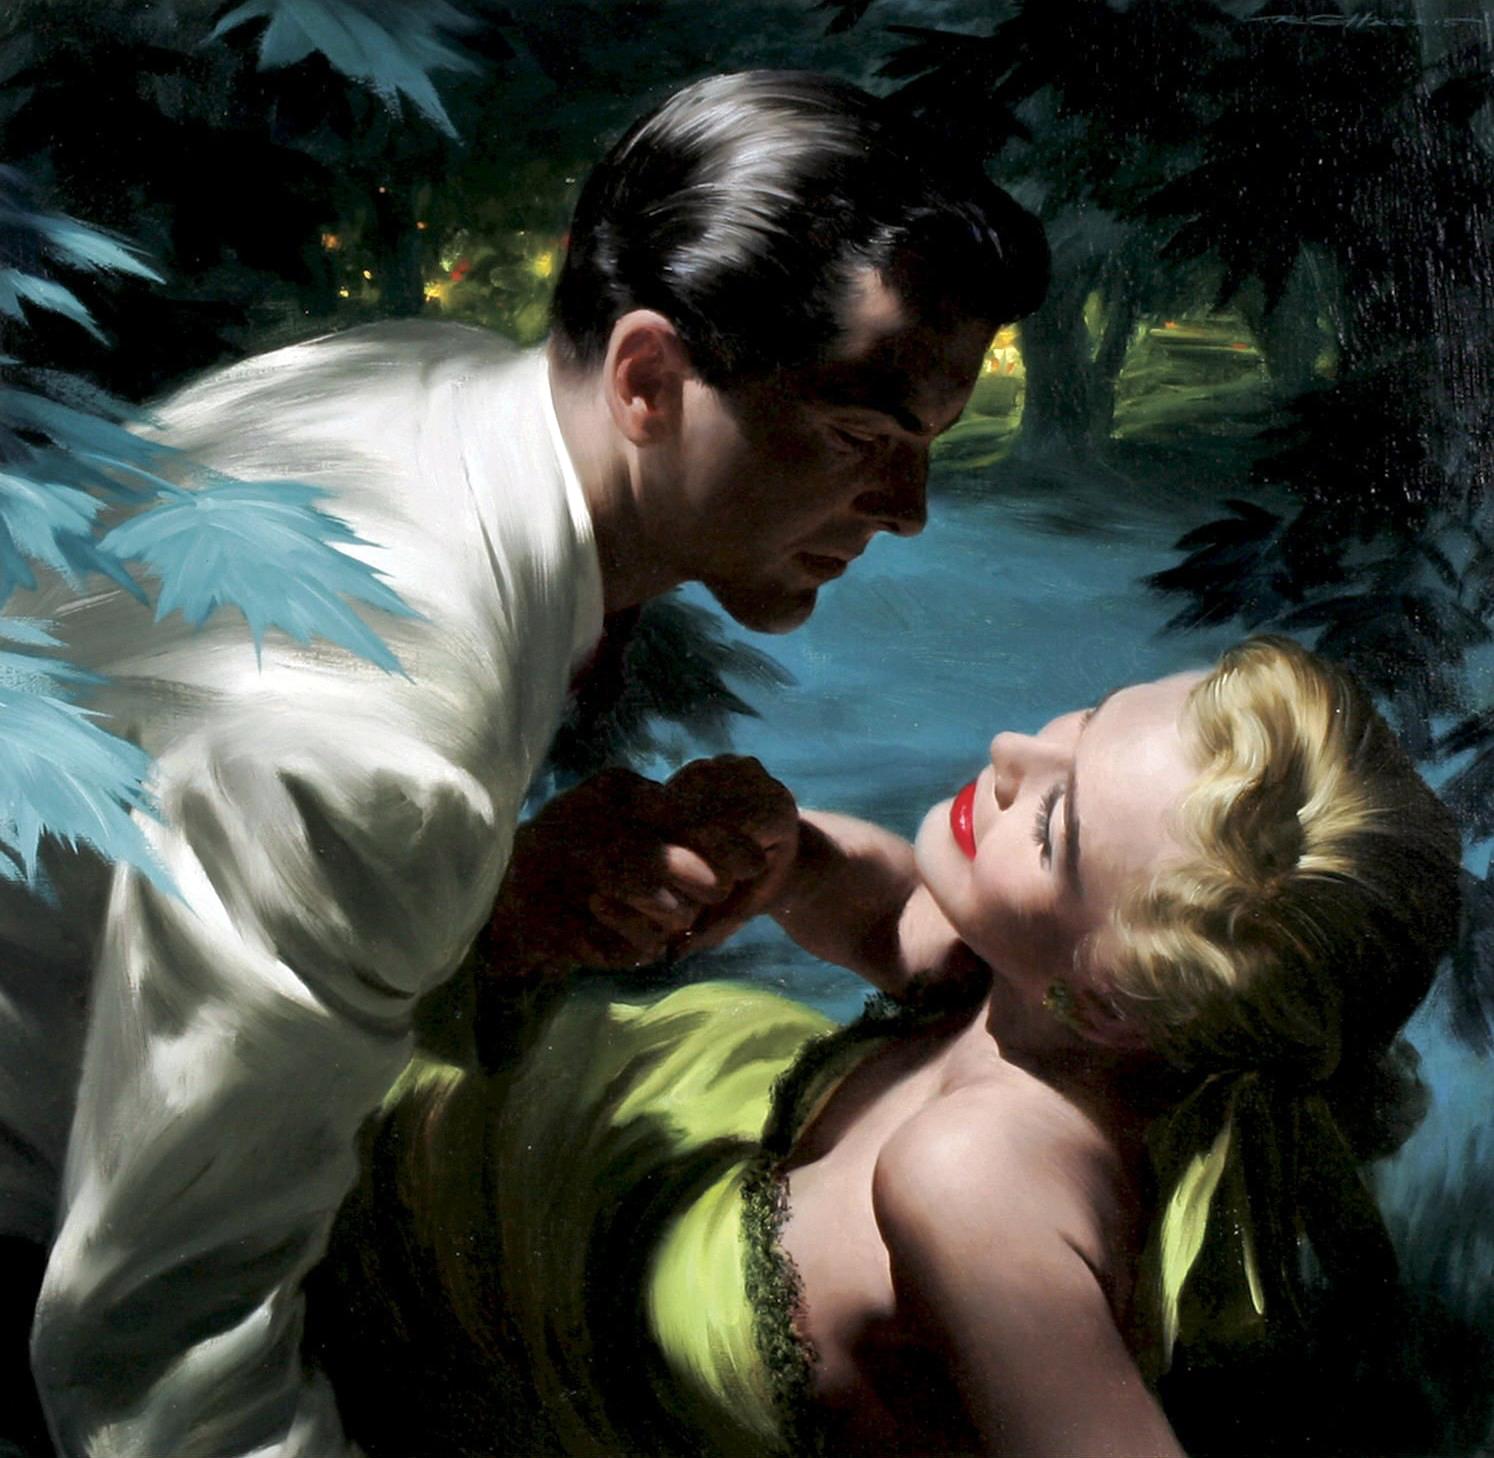 http://2.bp.blogspot.com/-q3je1sPJmyQ/T01yRx_5U4I/AAAAAAAAdpU/7ZiLwbXxFDk/s1600/ROBERT+GEORGE+HARRIS+(American+b.1911).+Summer+Bachelor,+c.1950.jpg